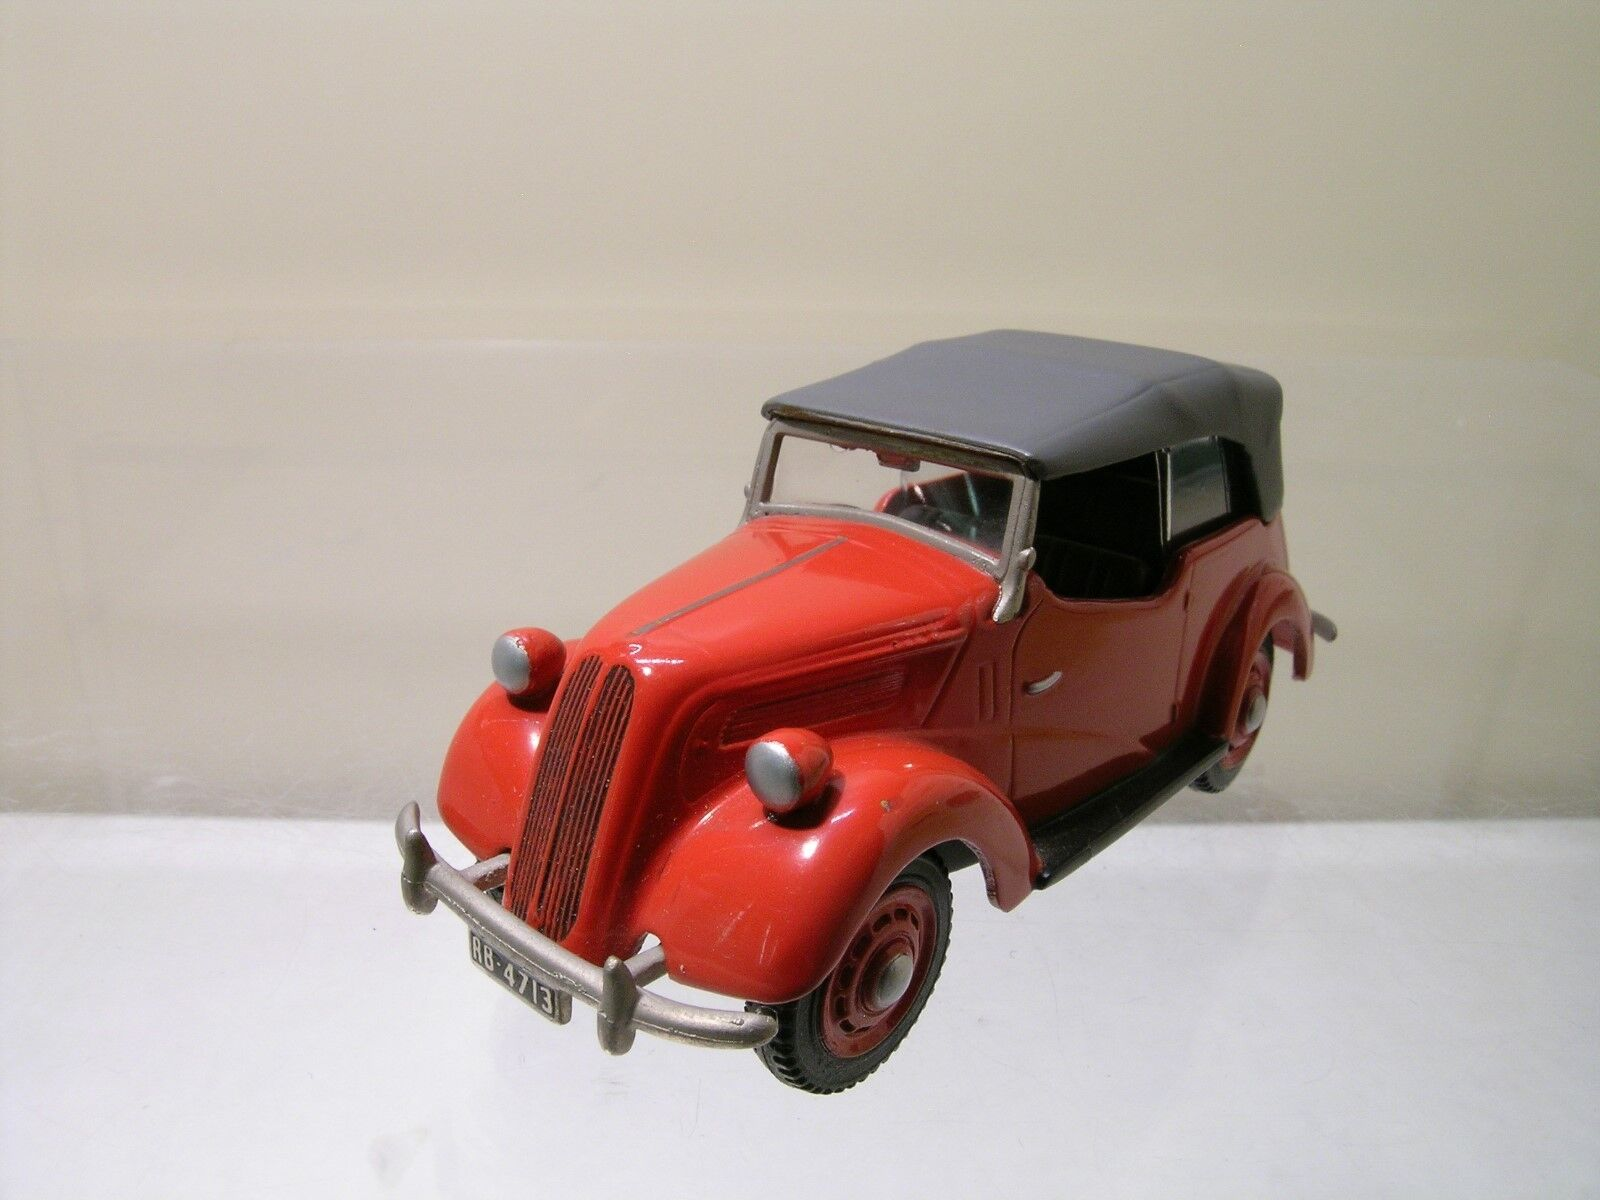 SOMERVILLE MODELS 117A FORD ANGLIA TOURER COLOUR rouge gris HANDBUILT SCALE 1 43